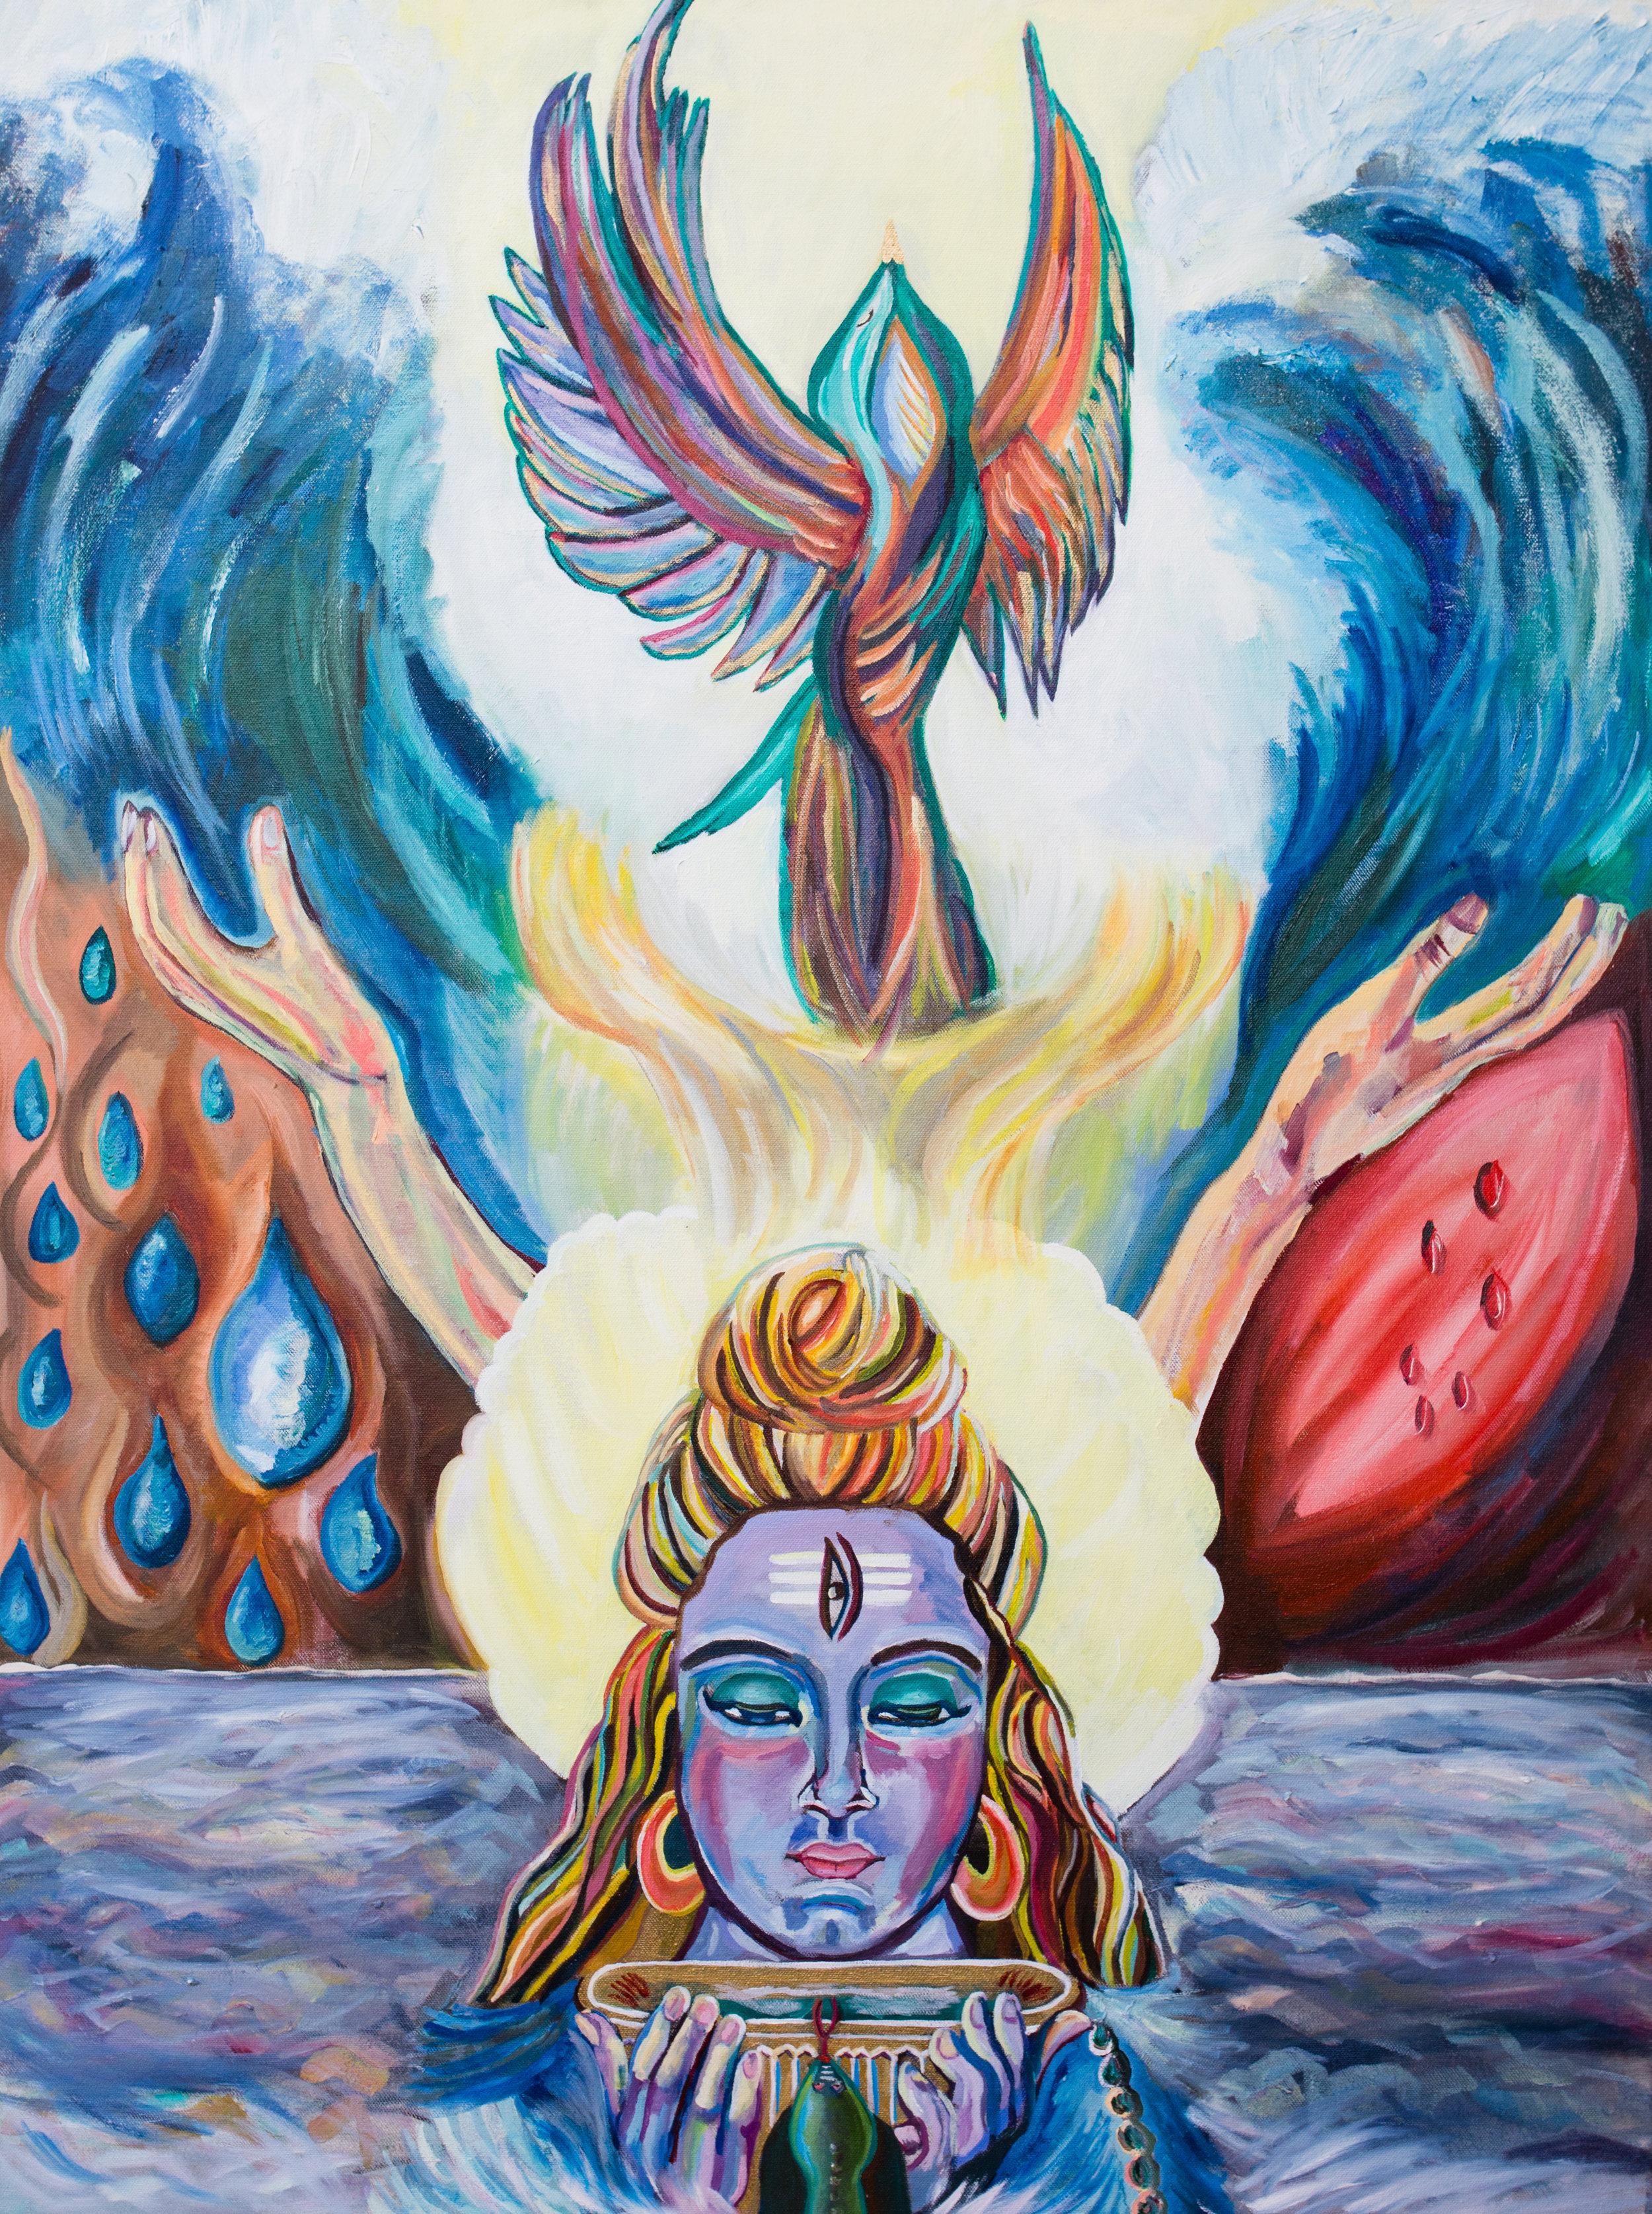 "Risen | Oil on canvas | 30 x 40"" | 2016"